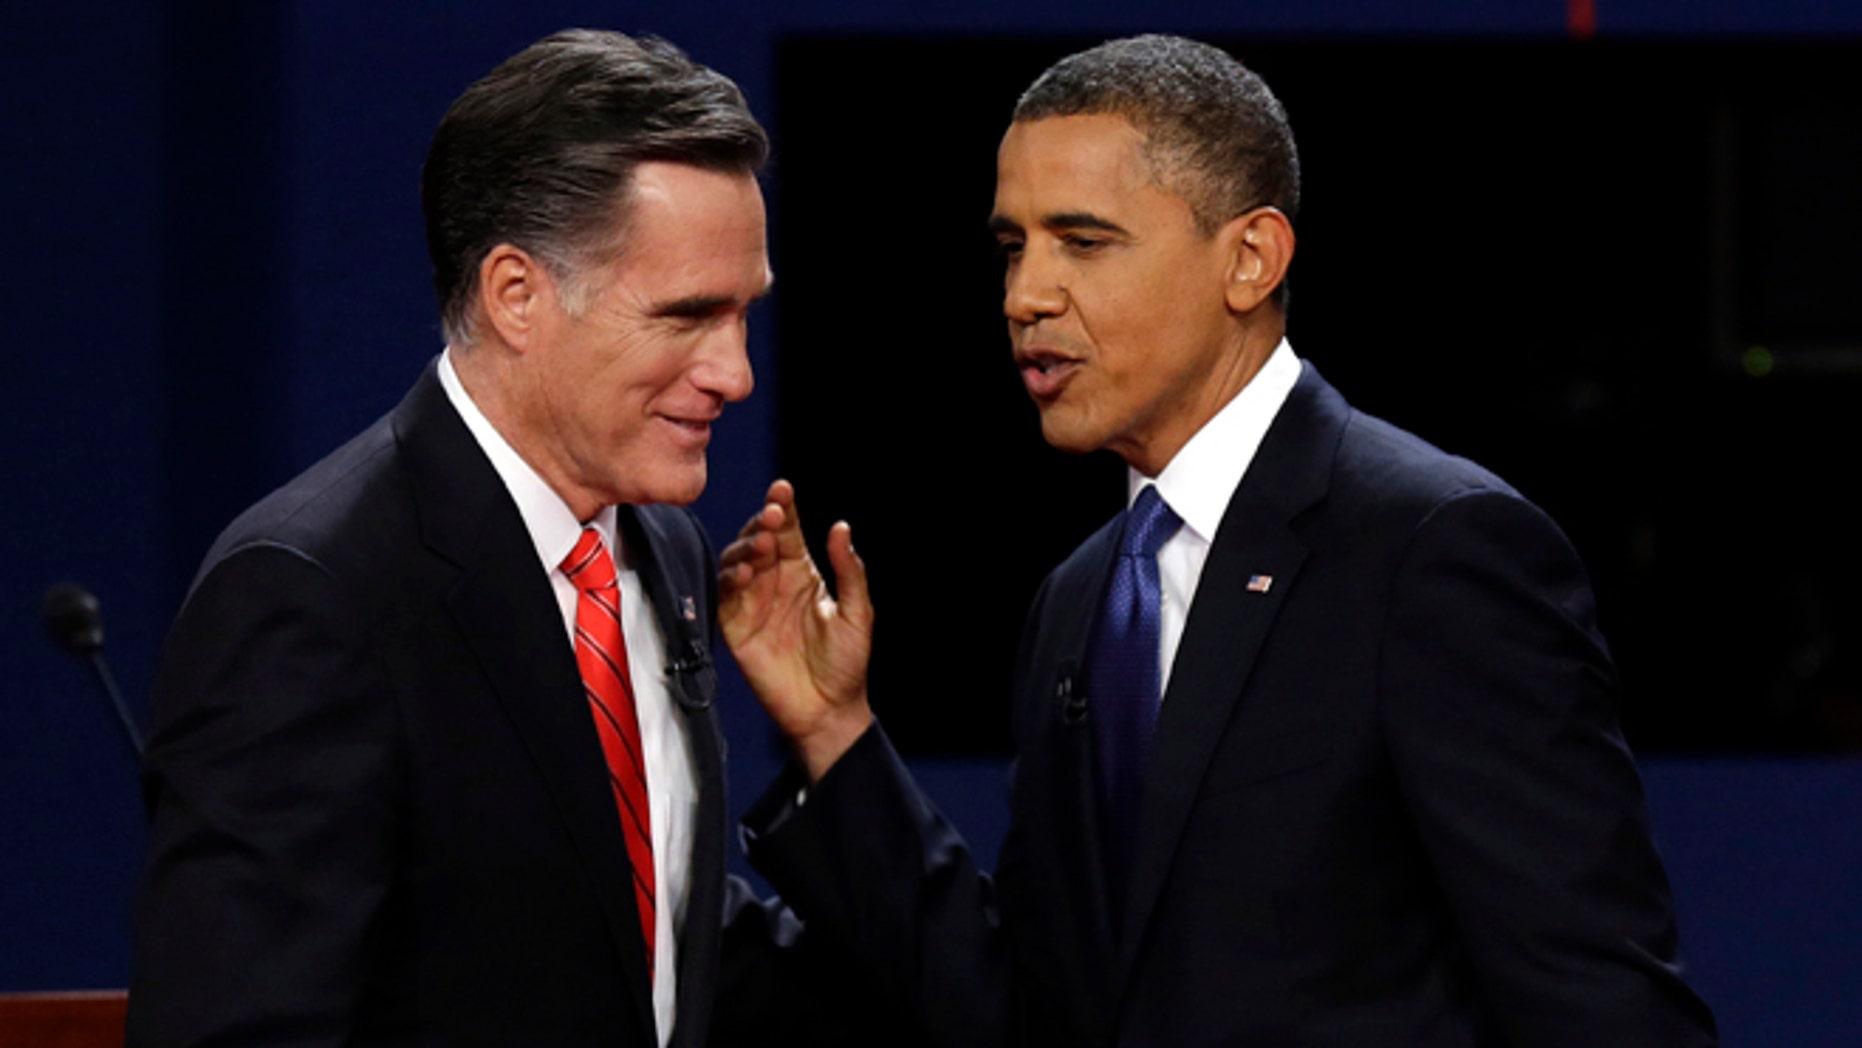 FILE: Oct. 3, 2012: Mitt Romney and President Obama talk after their debate at the University of Denver, in Denver.